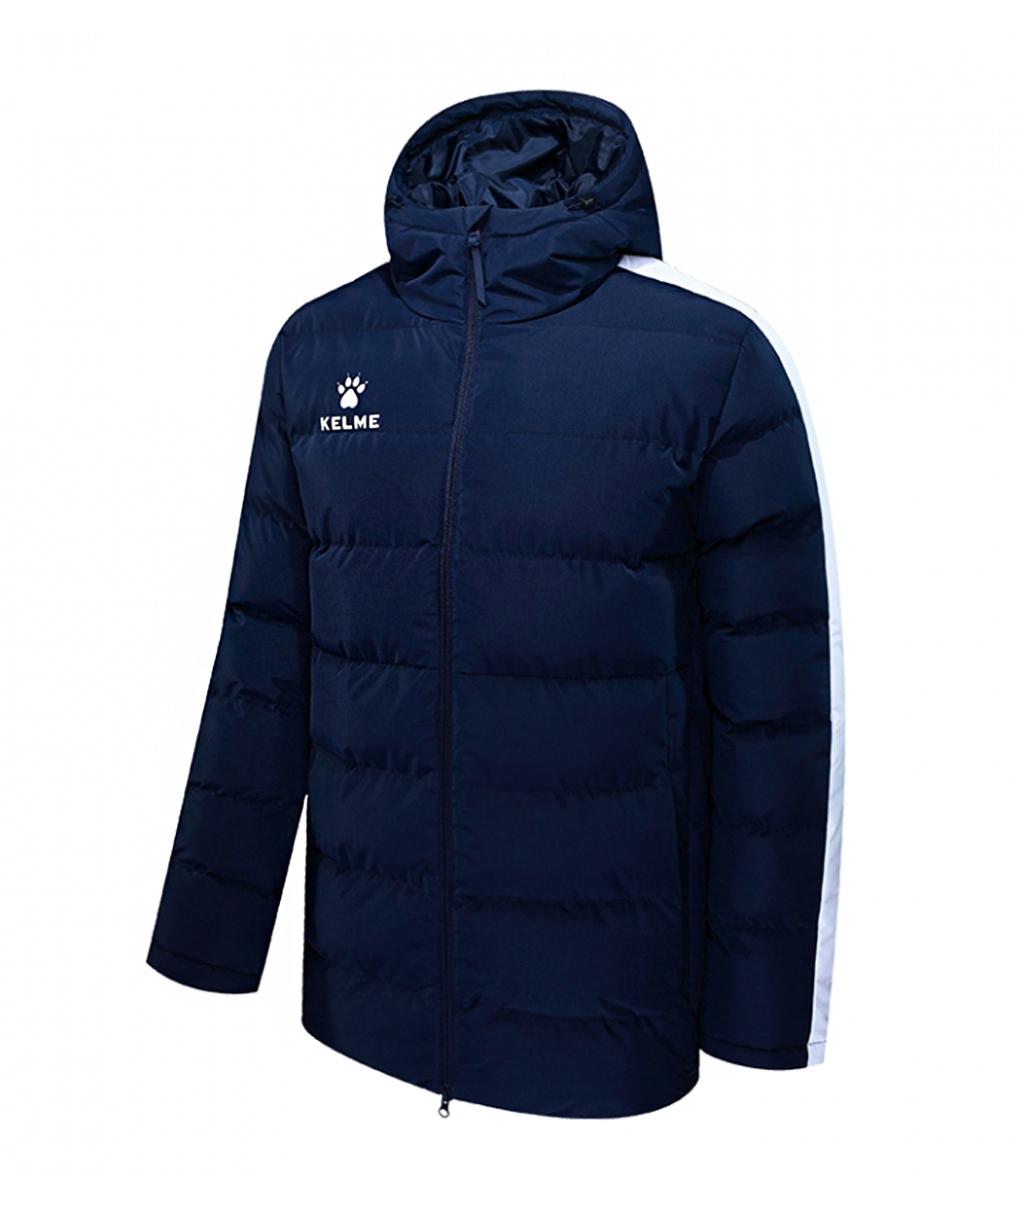 Тёмно-синяя утеплённая куртка Kelme Adult Padded Jacket 3881405-424